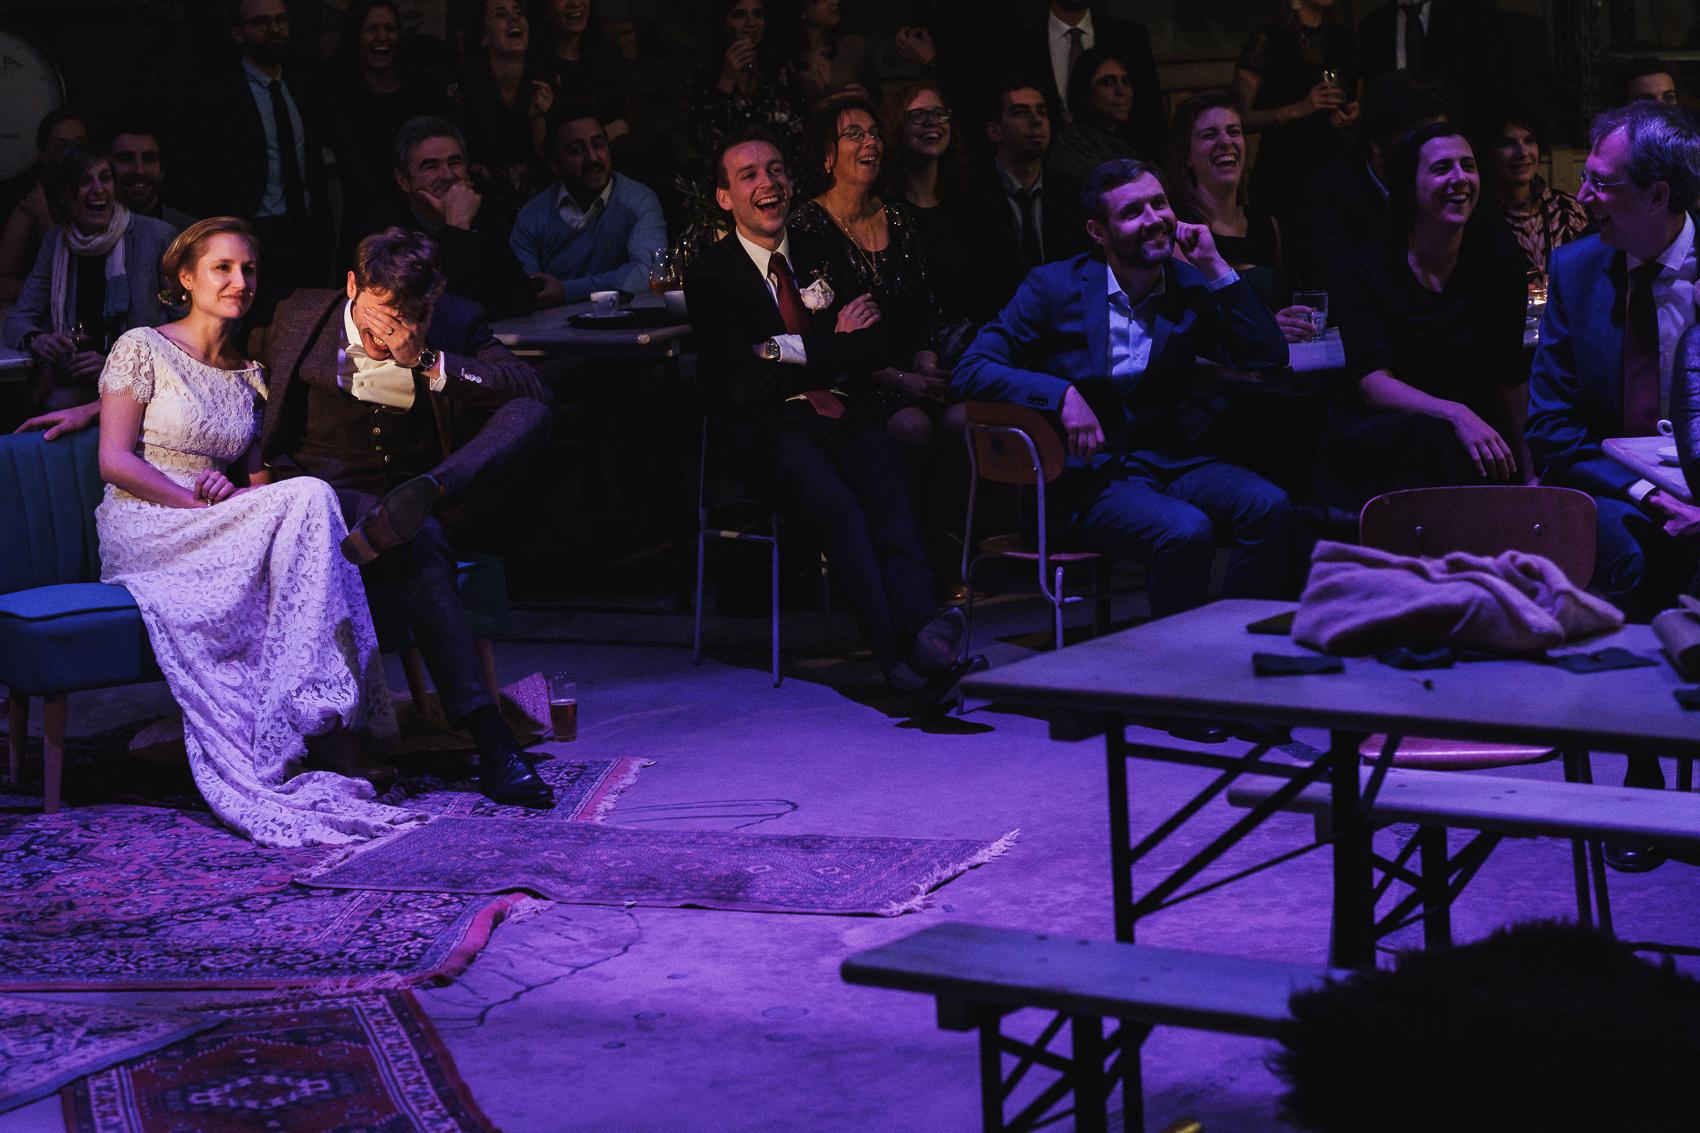 iso800 - trouwfotograaf Jolien en Christophe-63.jpg